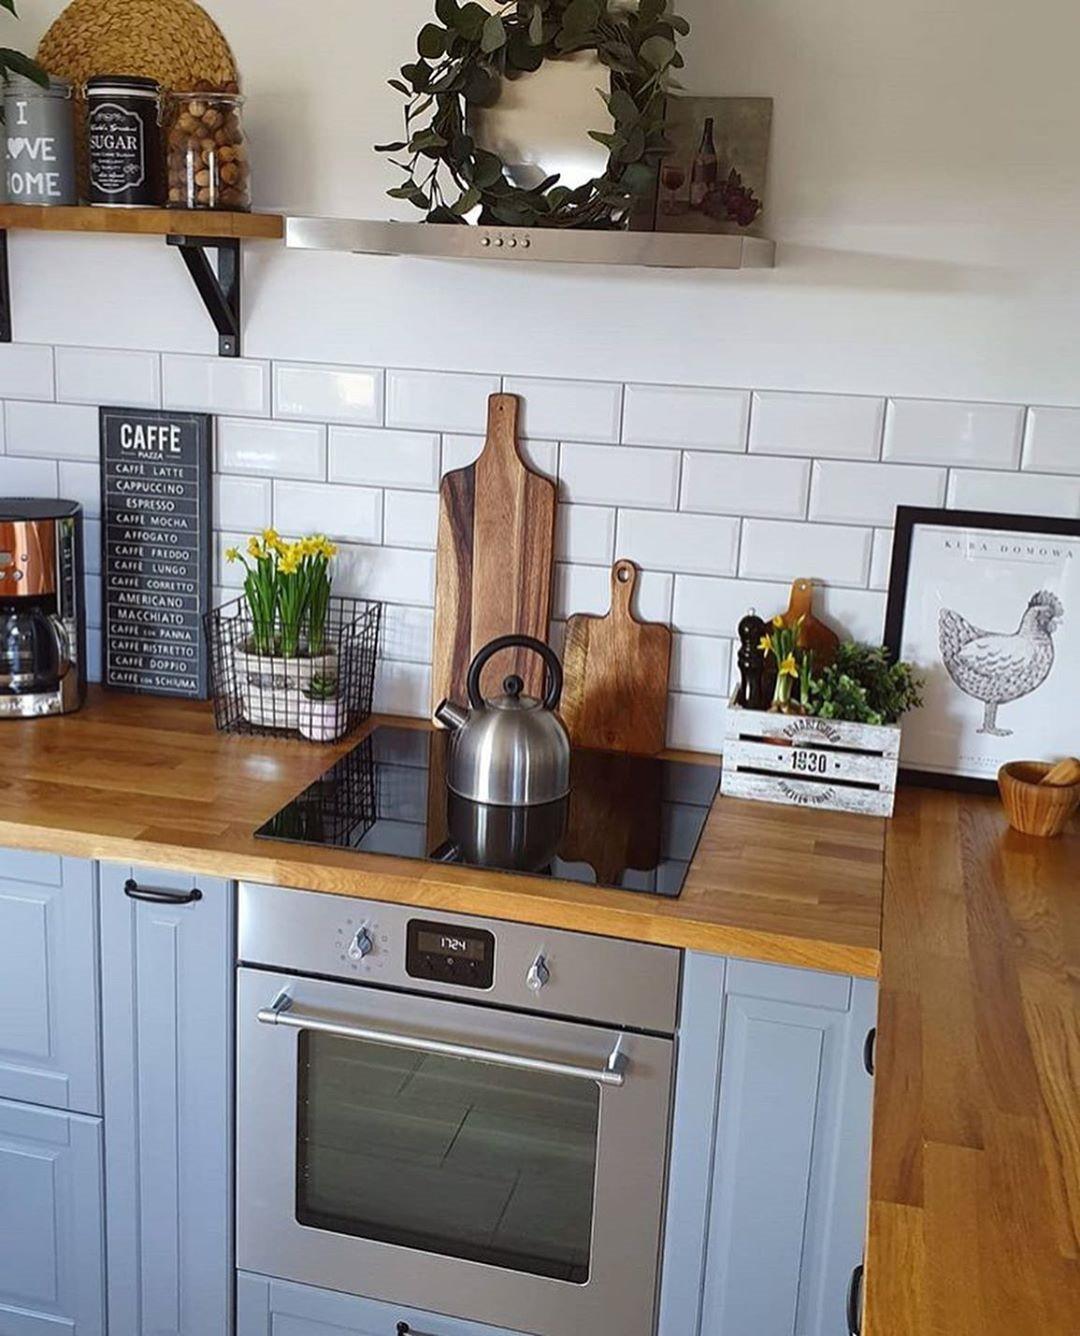 60 Creative Small Kitchen Design And Organization Ideas  #kitchens #kitchendesign #kitchenorganization #SmallKitchen